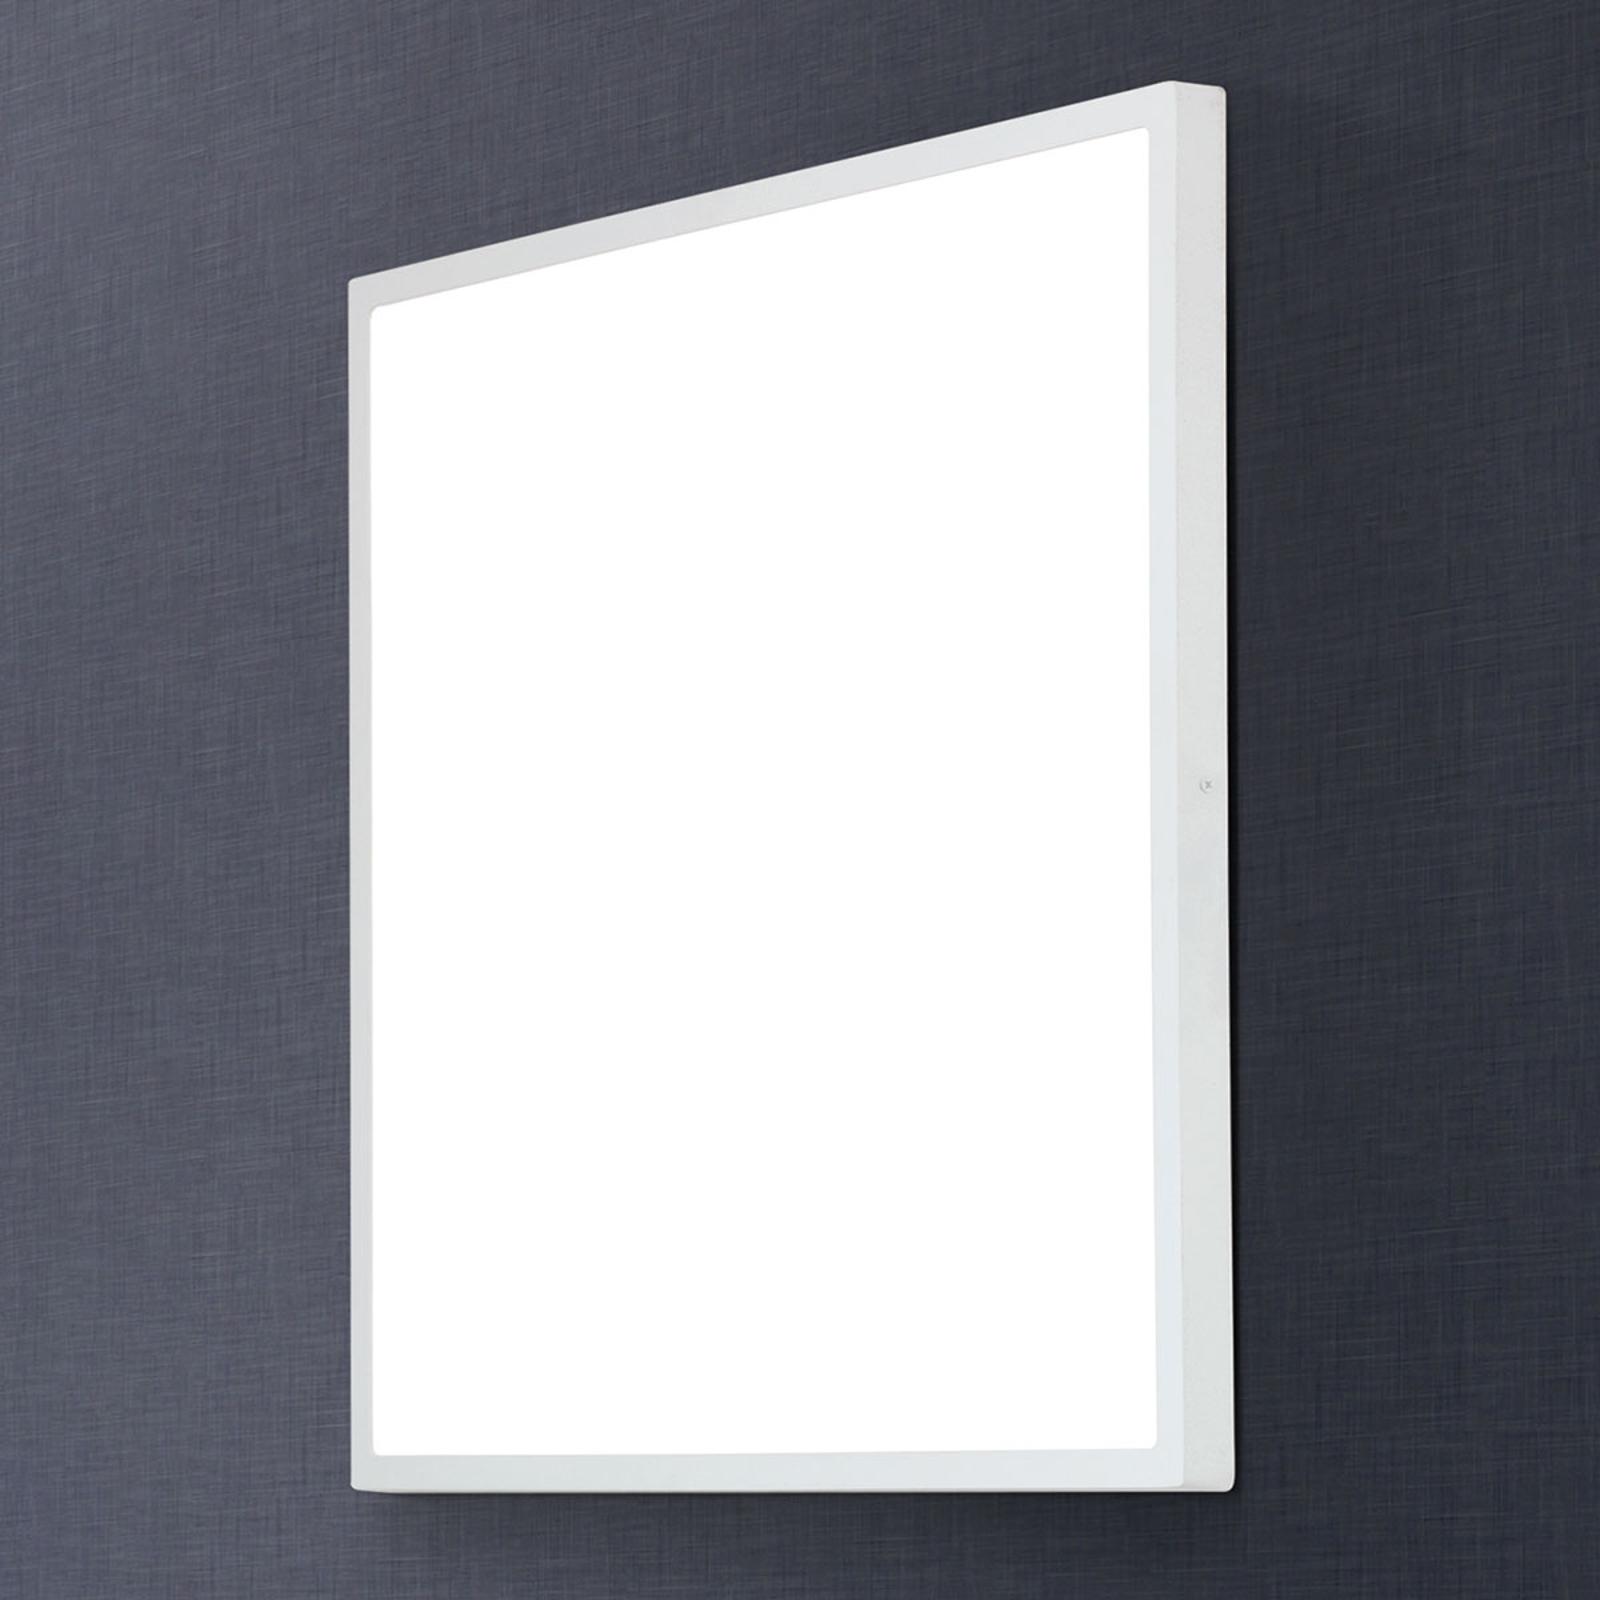 Kulmikas LED-seinävalaisin Lero 60 x 60 cm